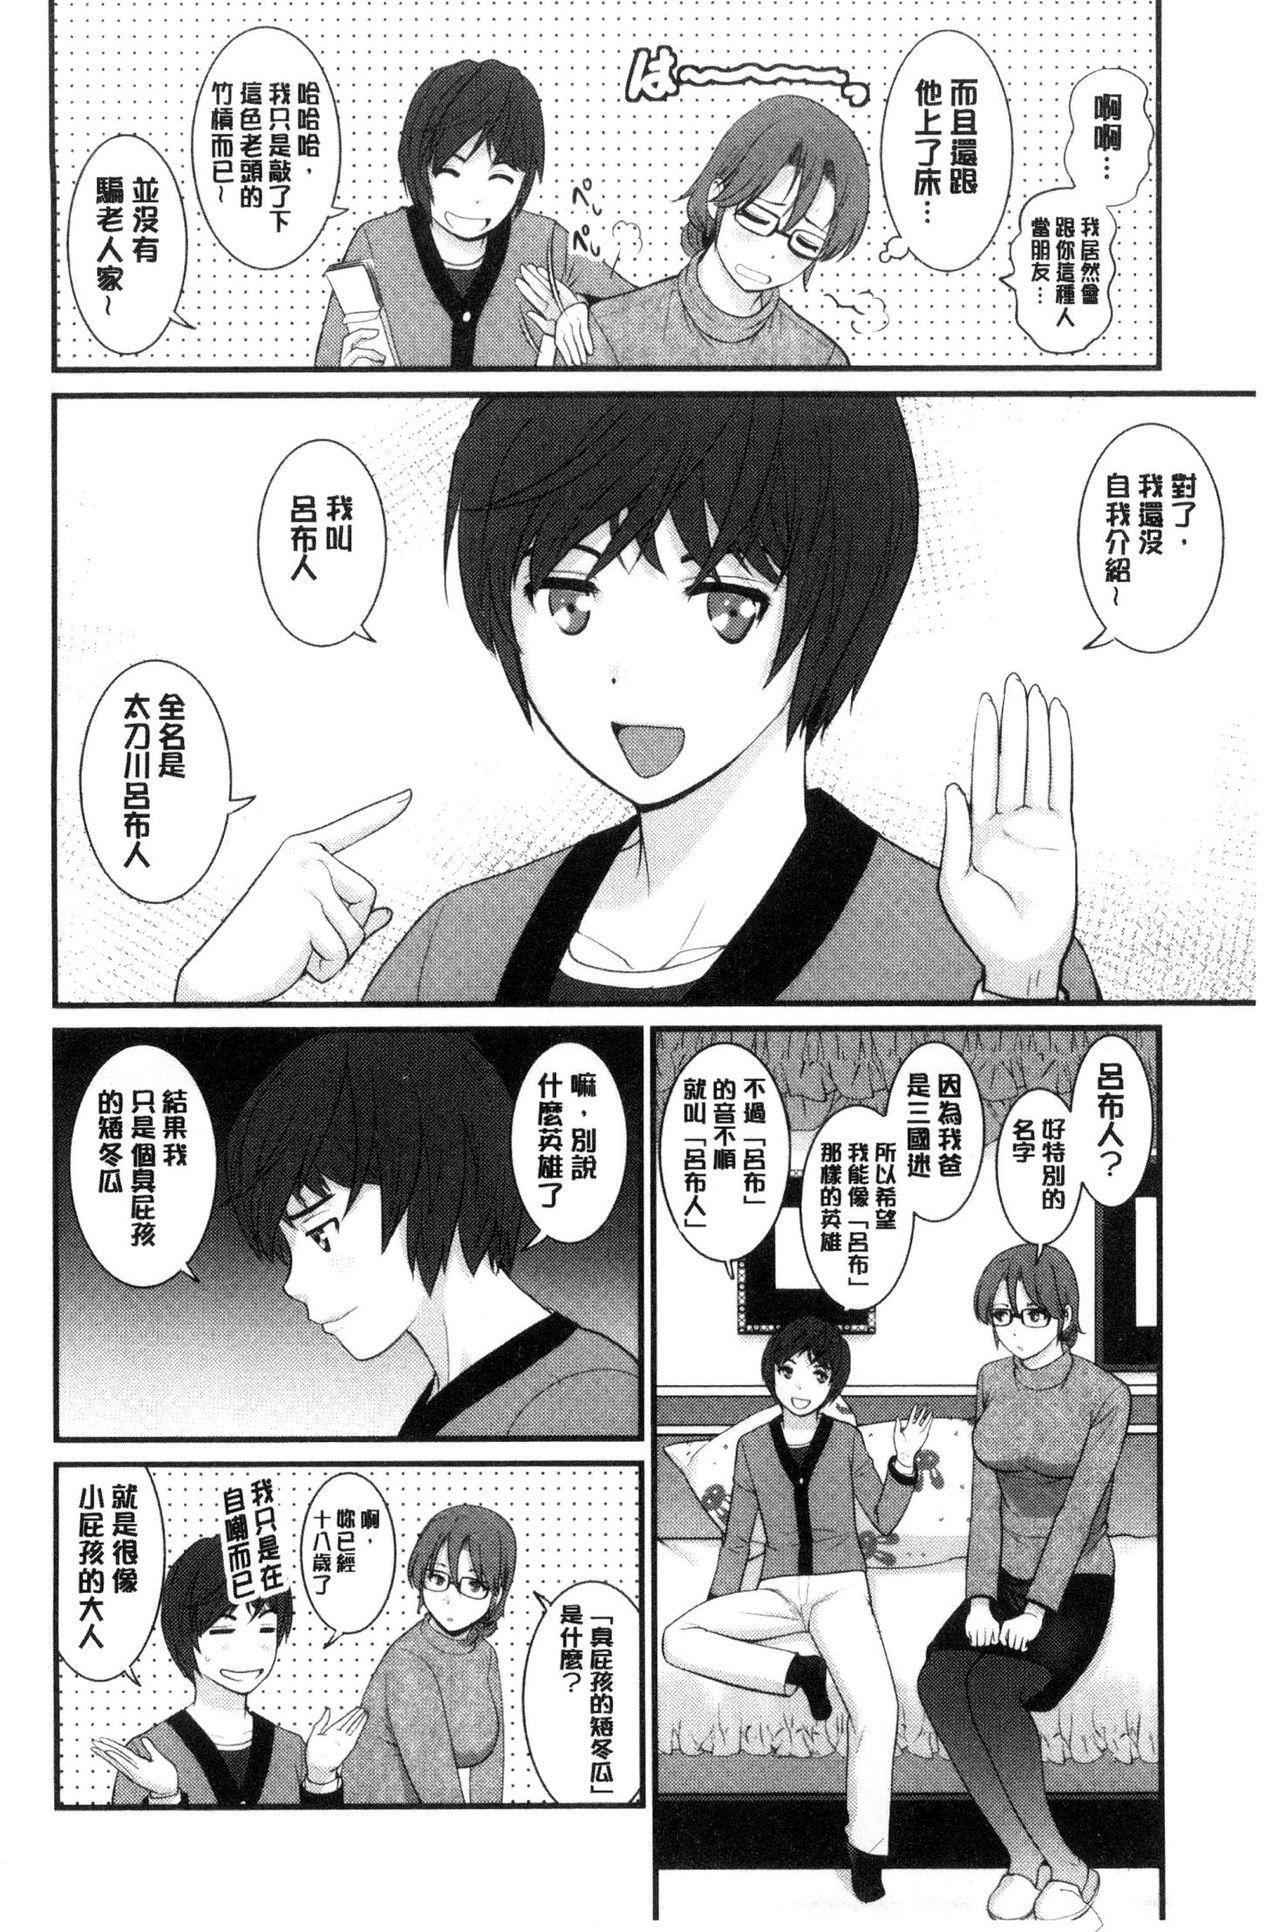 Toshimaku Sodachi no Toshima-san   年增區孕育的豐島小姐 28